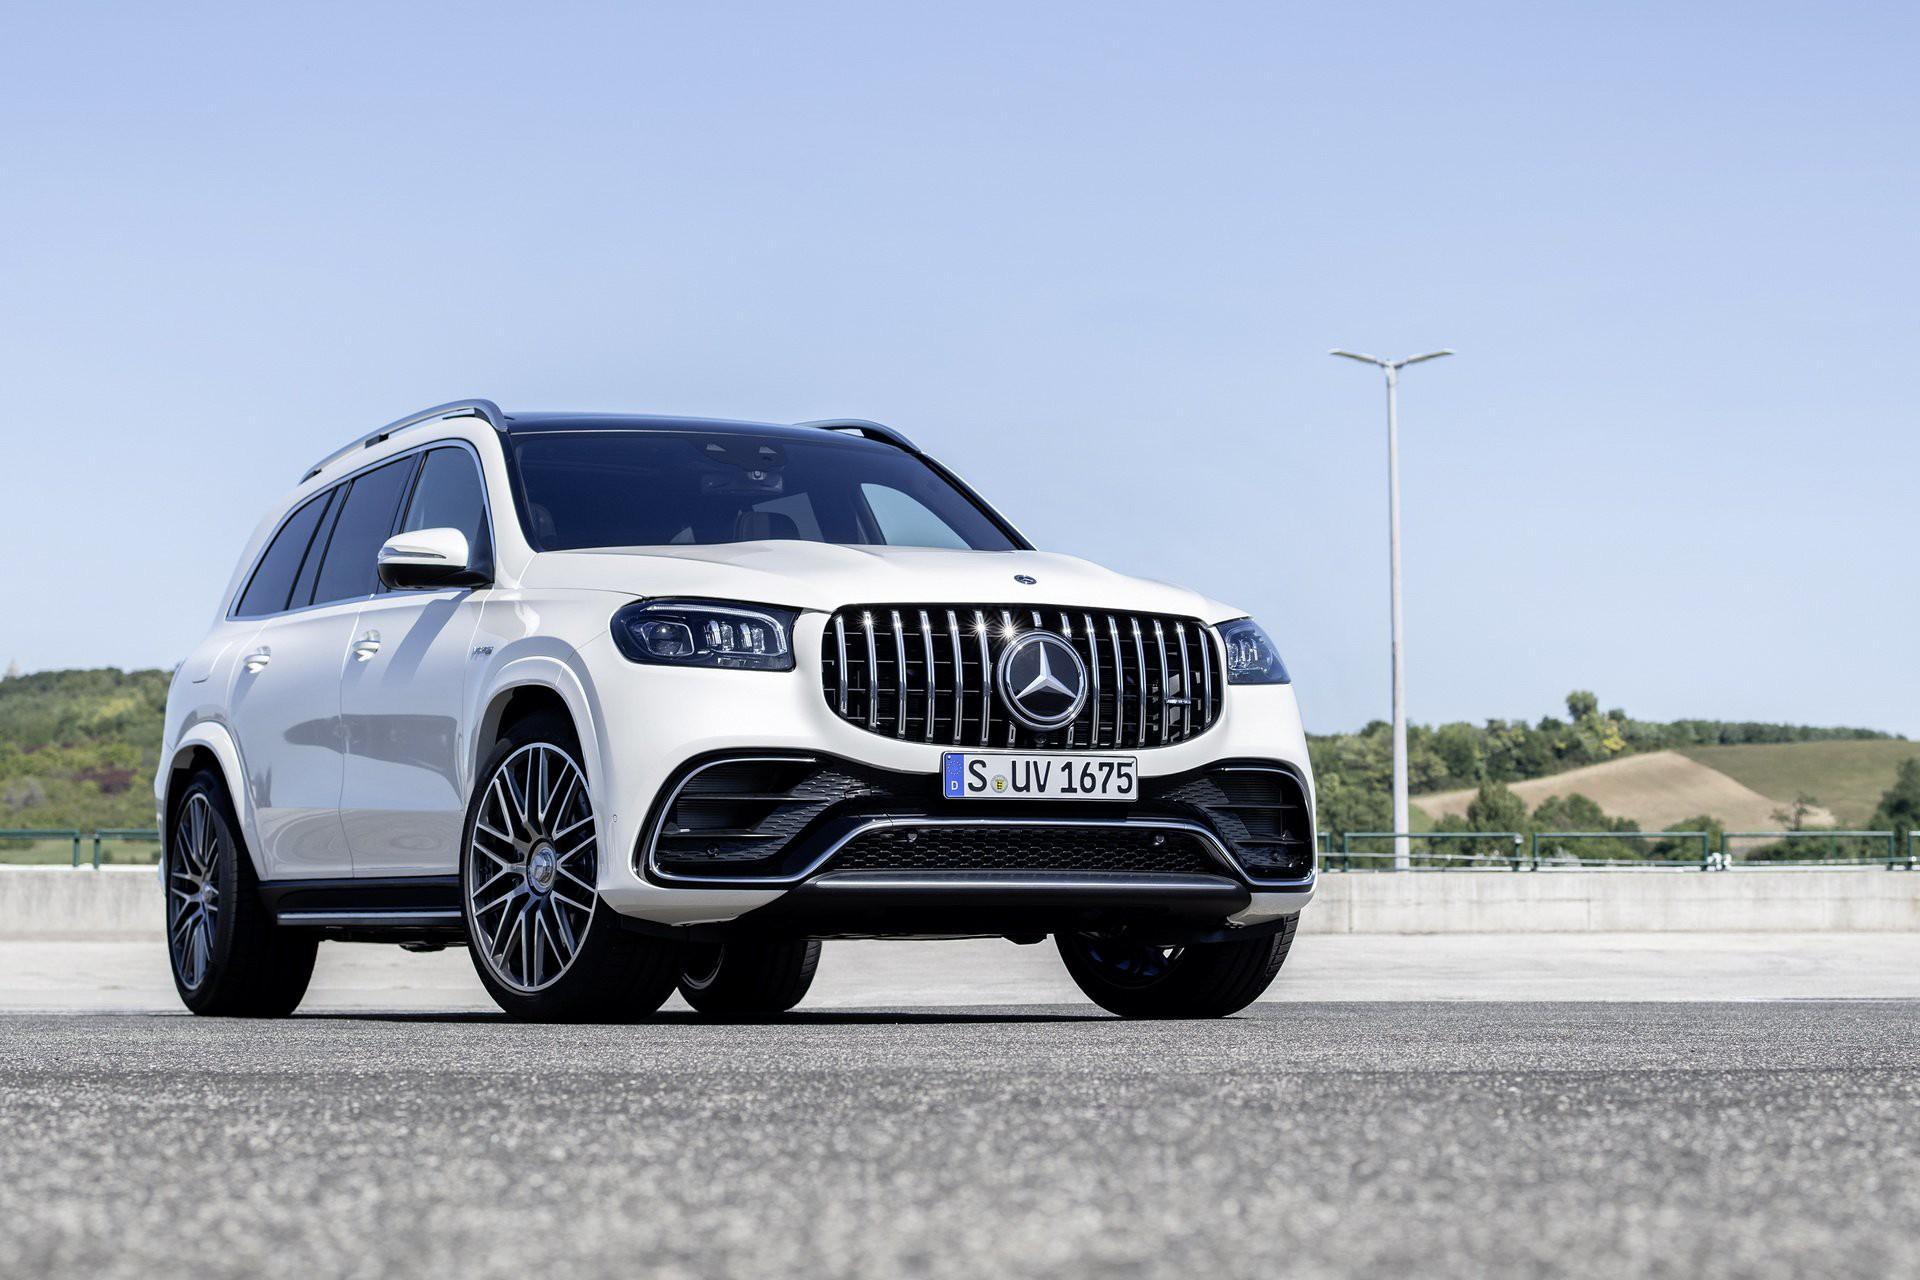 Khám phá Mercedes GLS 63 2020 vừa ra mắt Ảnh 5